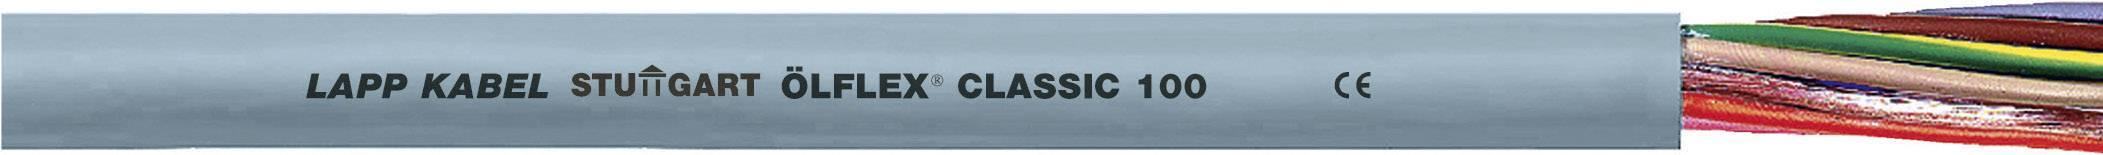 Kabel LappKabel Ölflex CLASSIC 100 5X1 (00102054), PVC, 7,1 mm, 500 V, šedá, 100 m